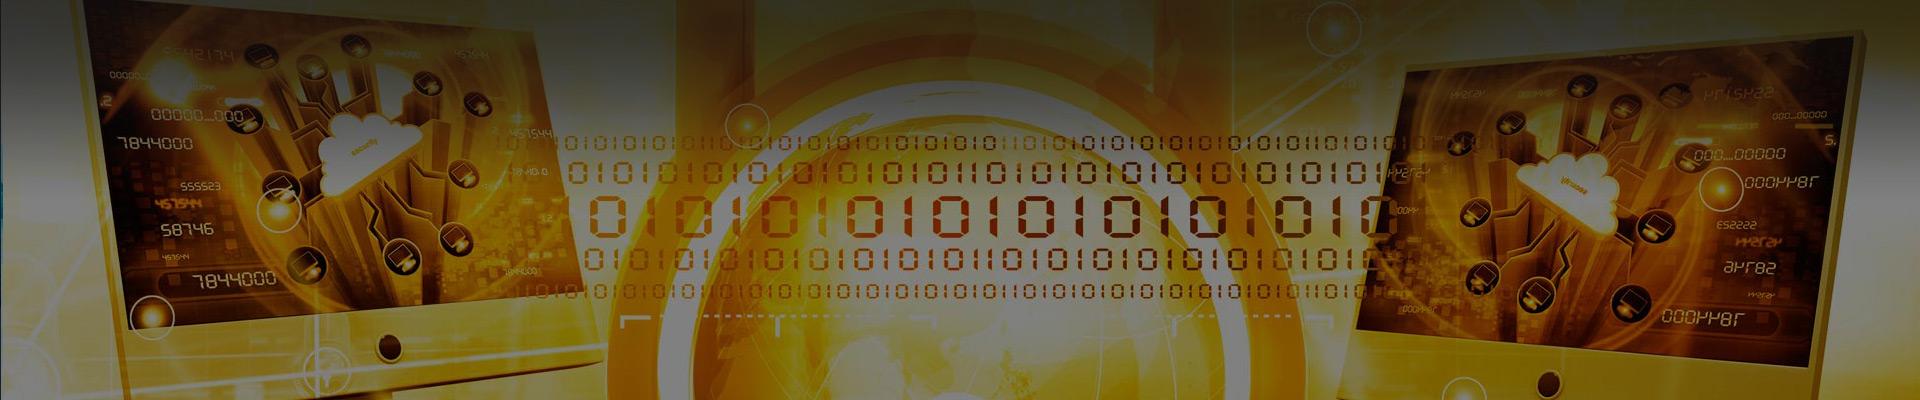 sistemas de encriptacion